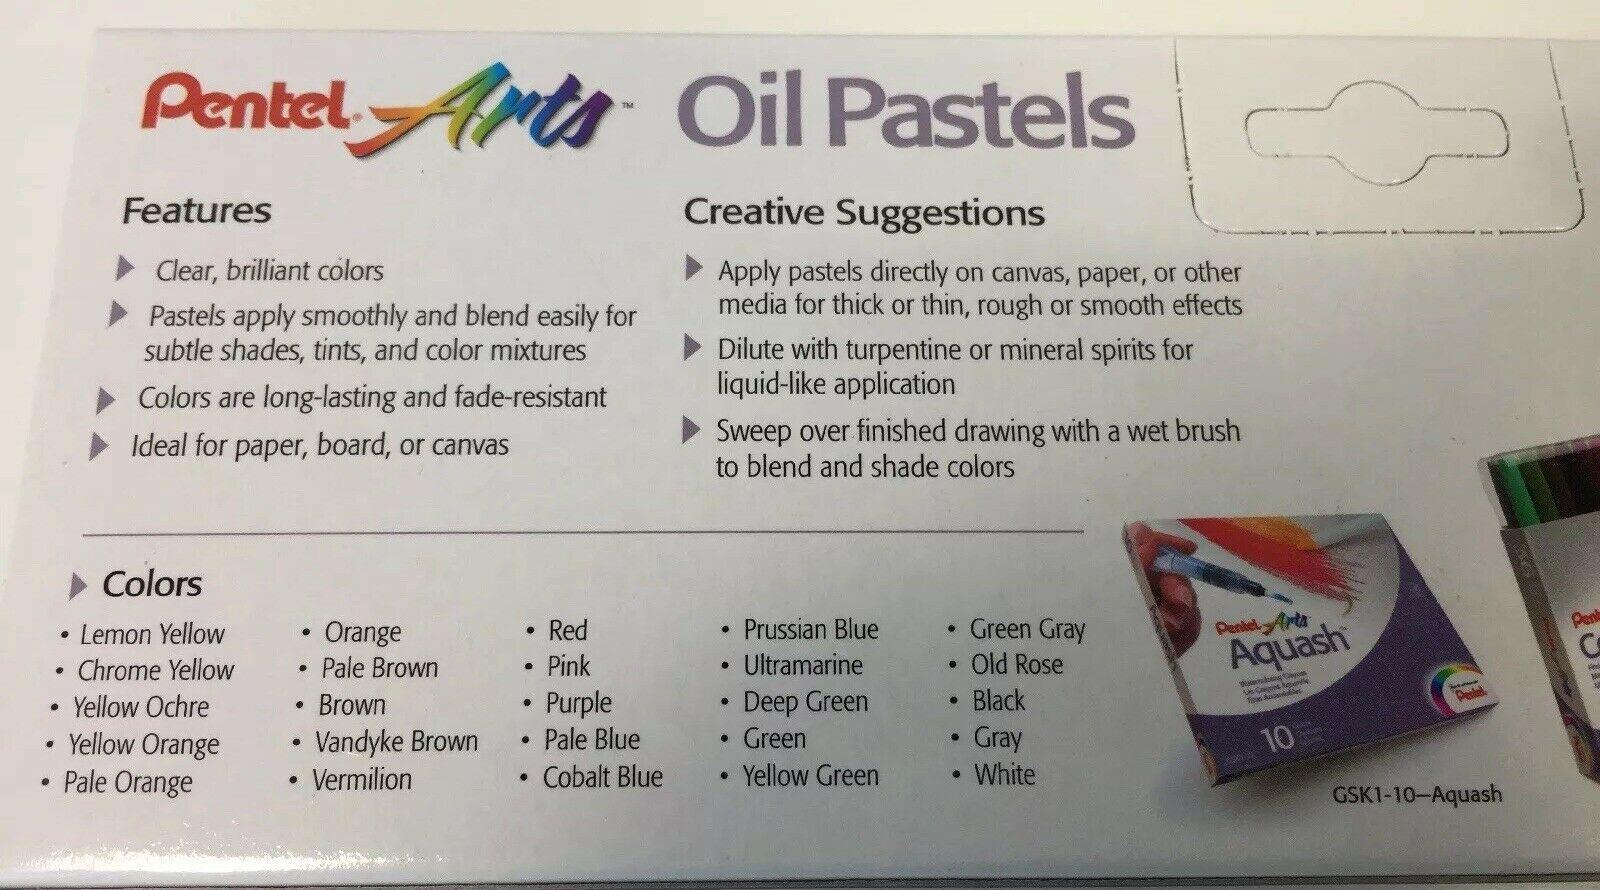 Pentel Arts Oil Pastels Artist Drawing 2 Box Sets Kits 25 ct 12 ct PHN-25 PHN-12